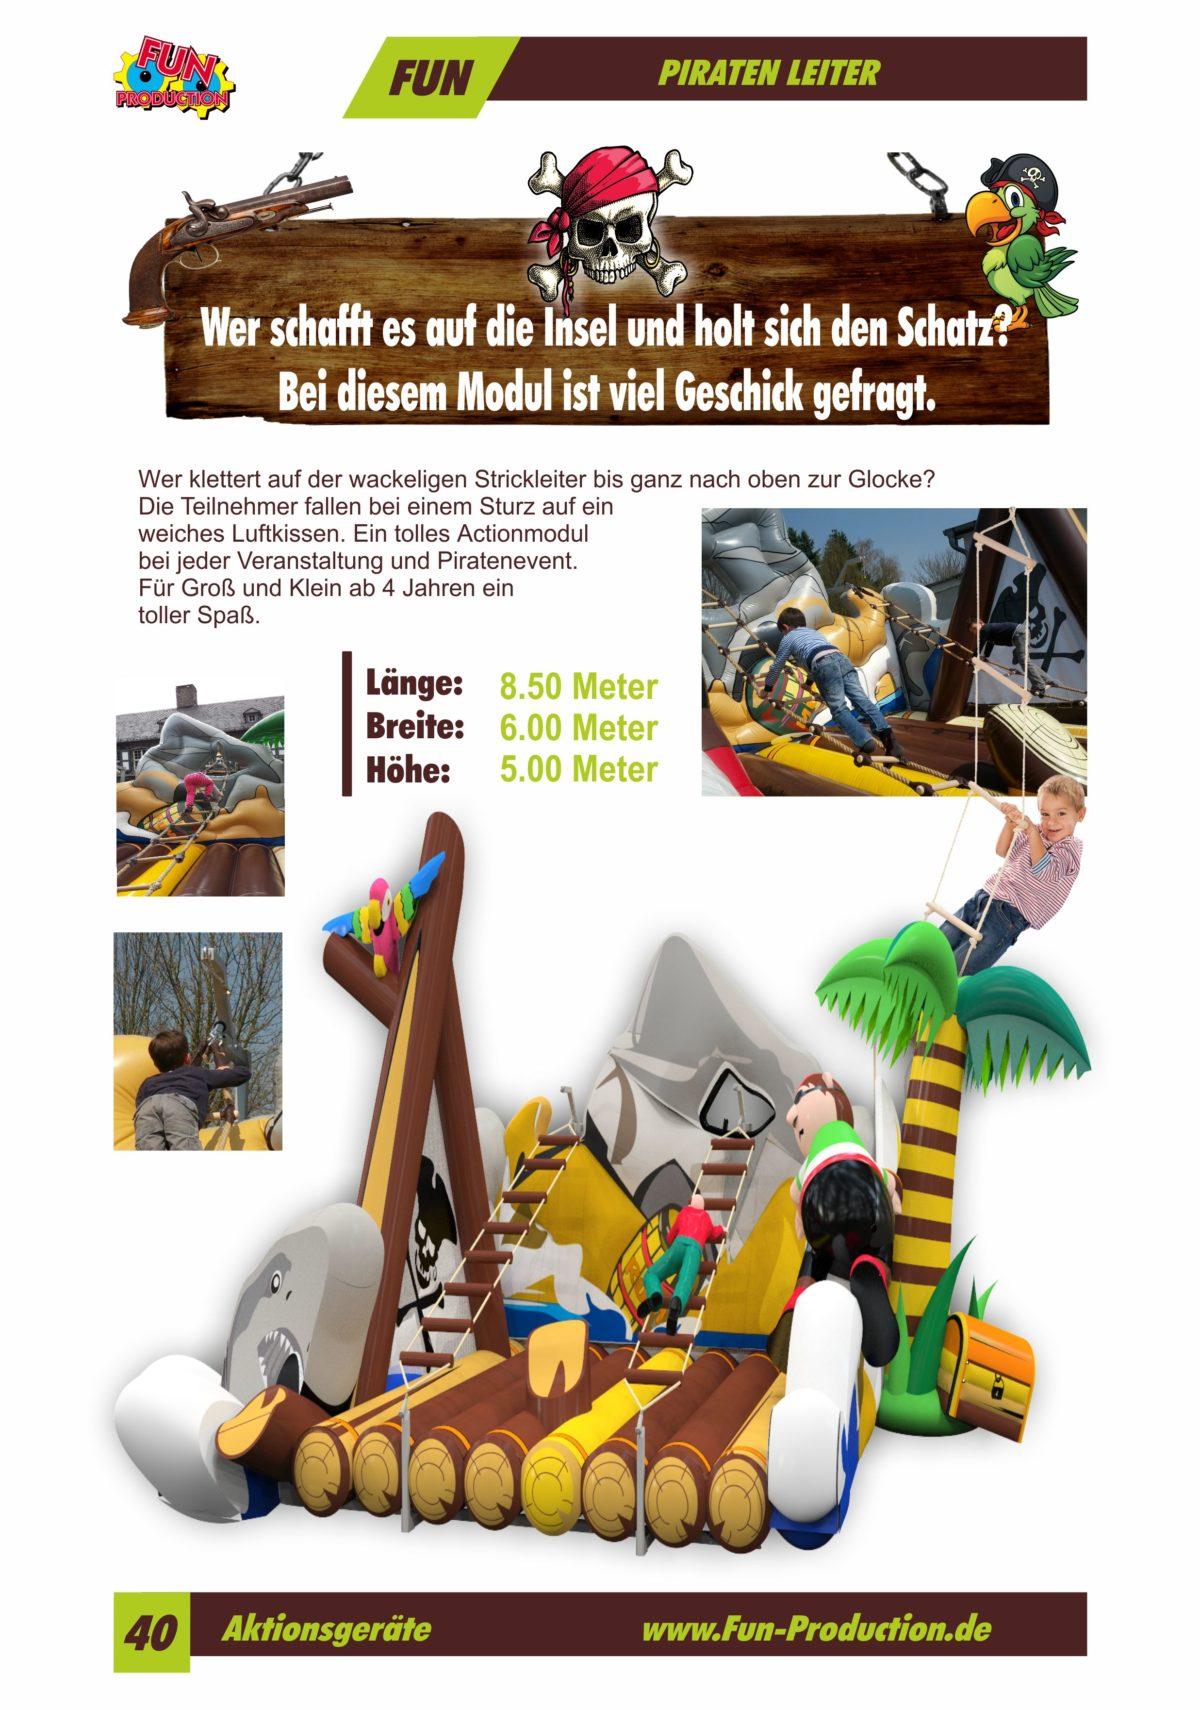 Piratenleiter Fun Production GmbH